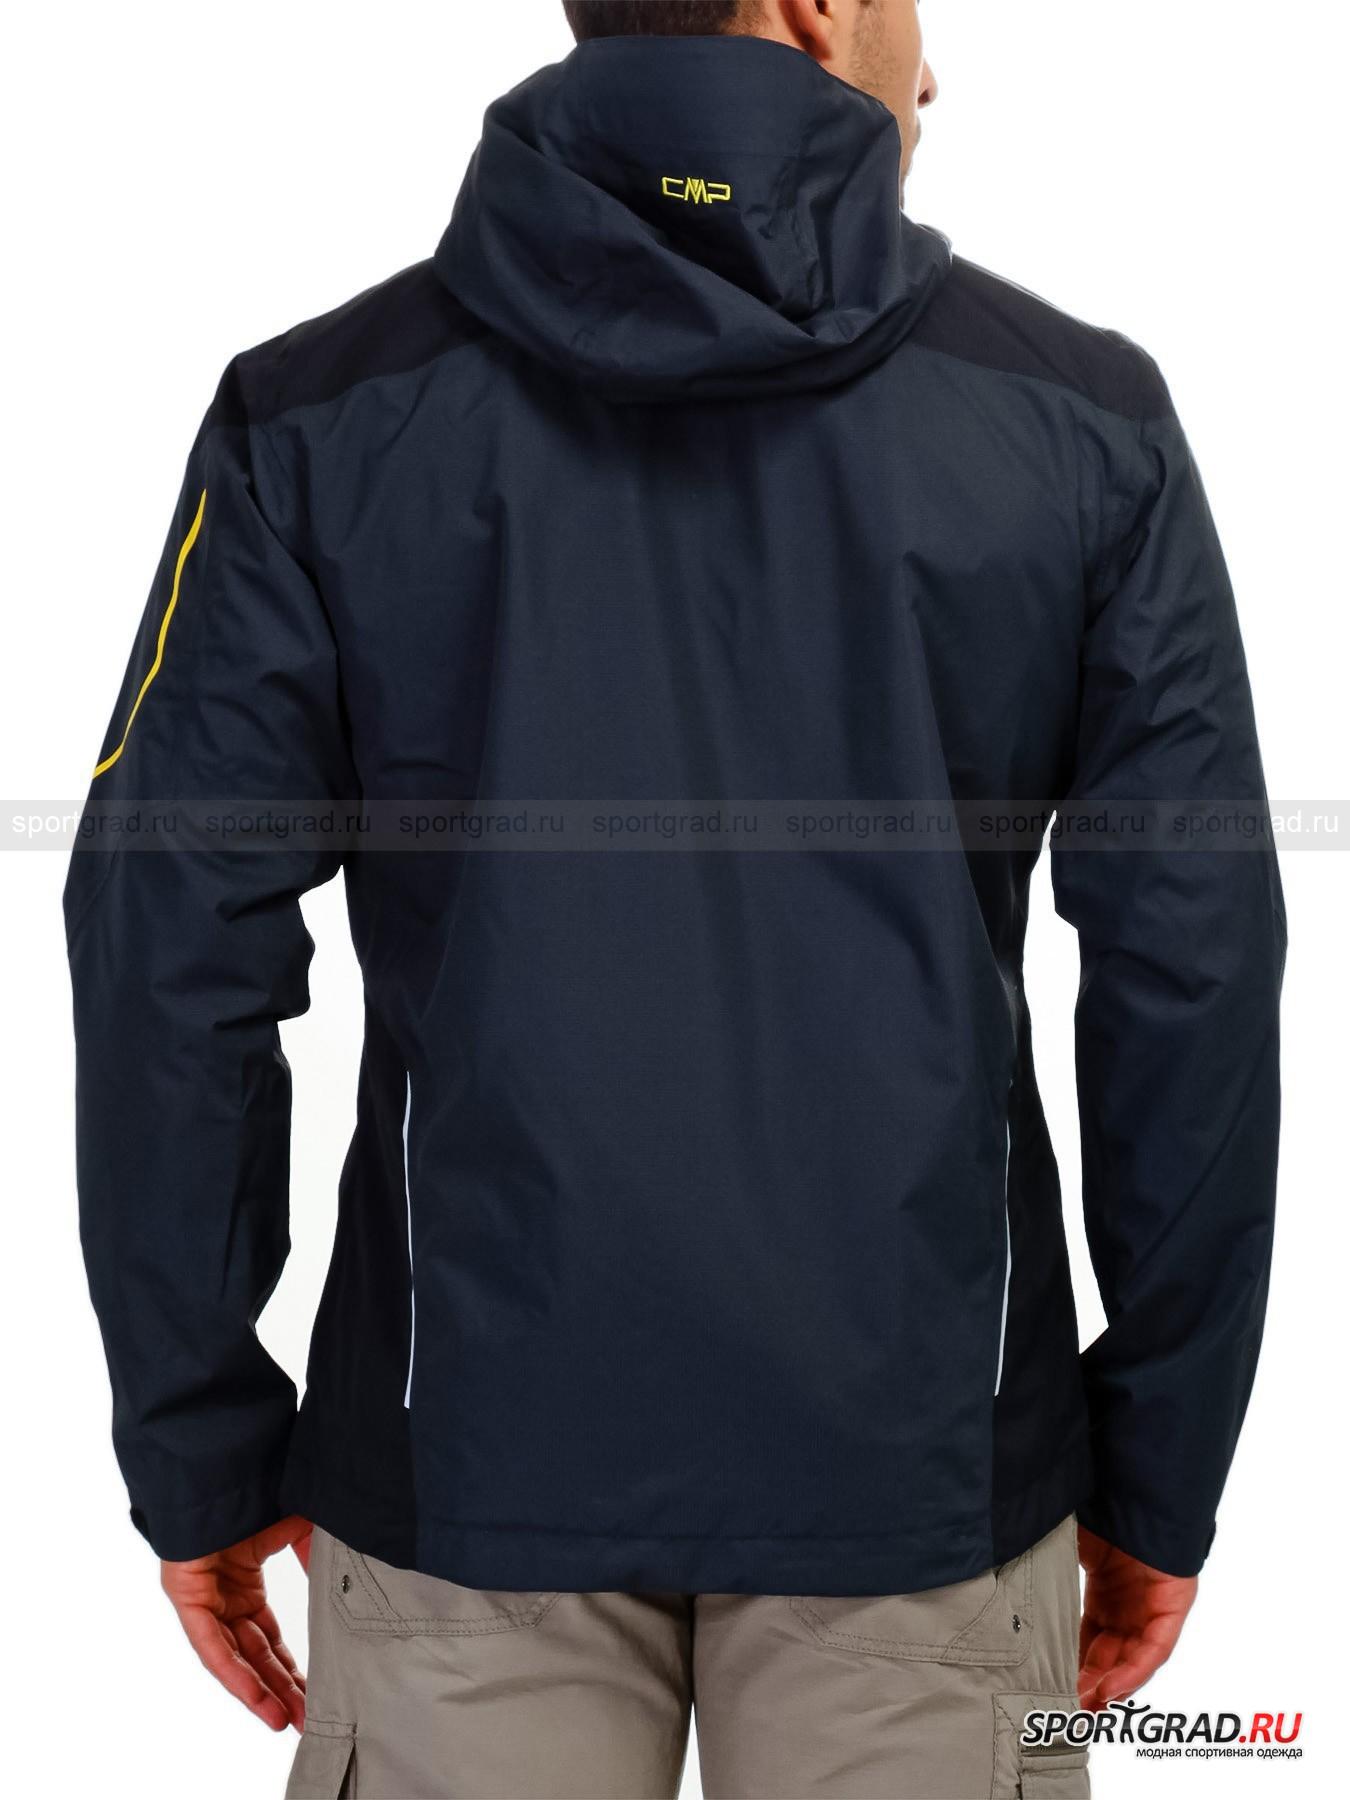 Куртка мужская ZIP HOOD JACKET RIPSTOP CAMPAGNOLO от Спортград